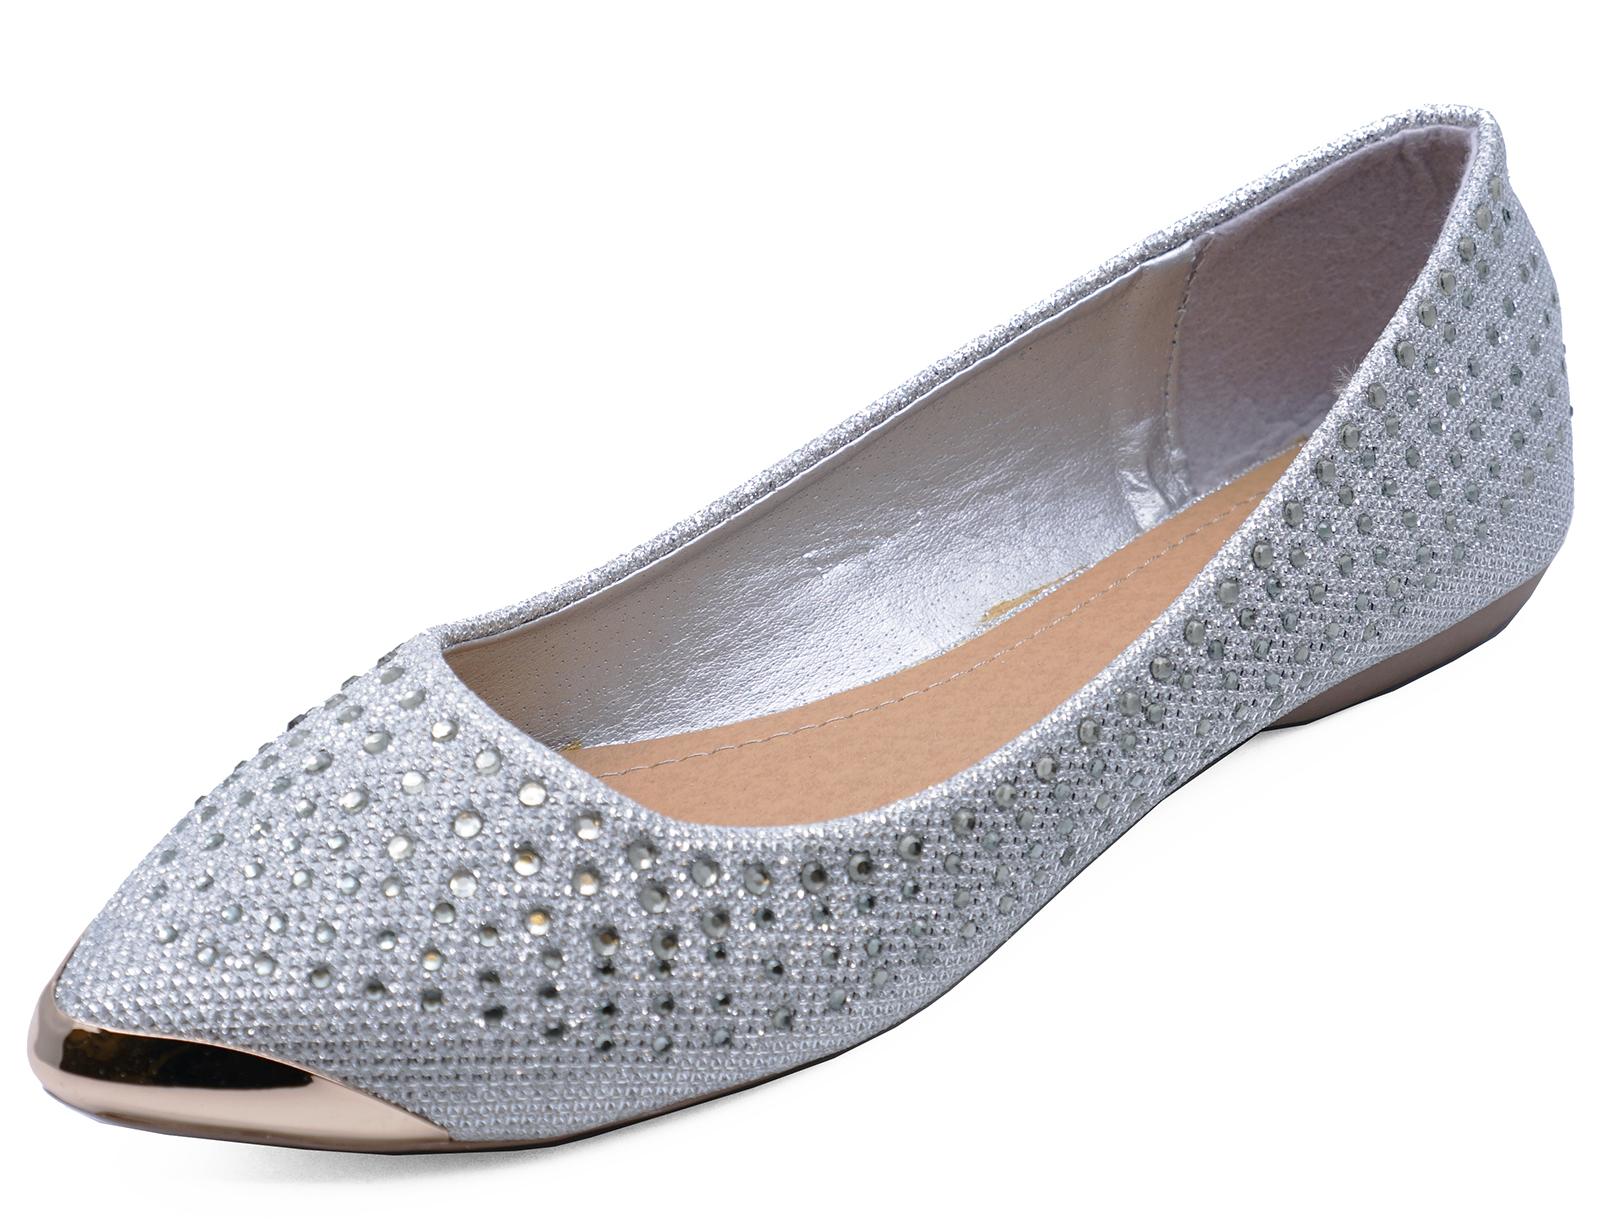 88b95f673d8 WOMENS FLAT SILVER SLIP-ON WEDDING BRIDESMAID BRIDAL COMFY SHOES ...